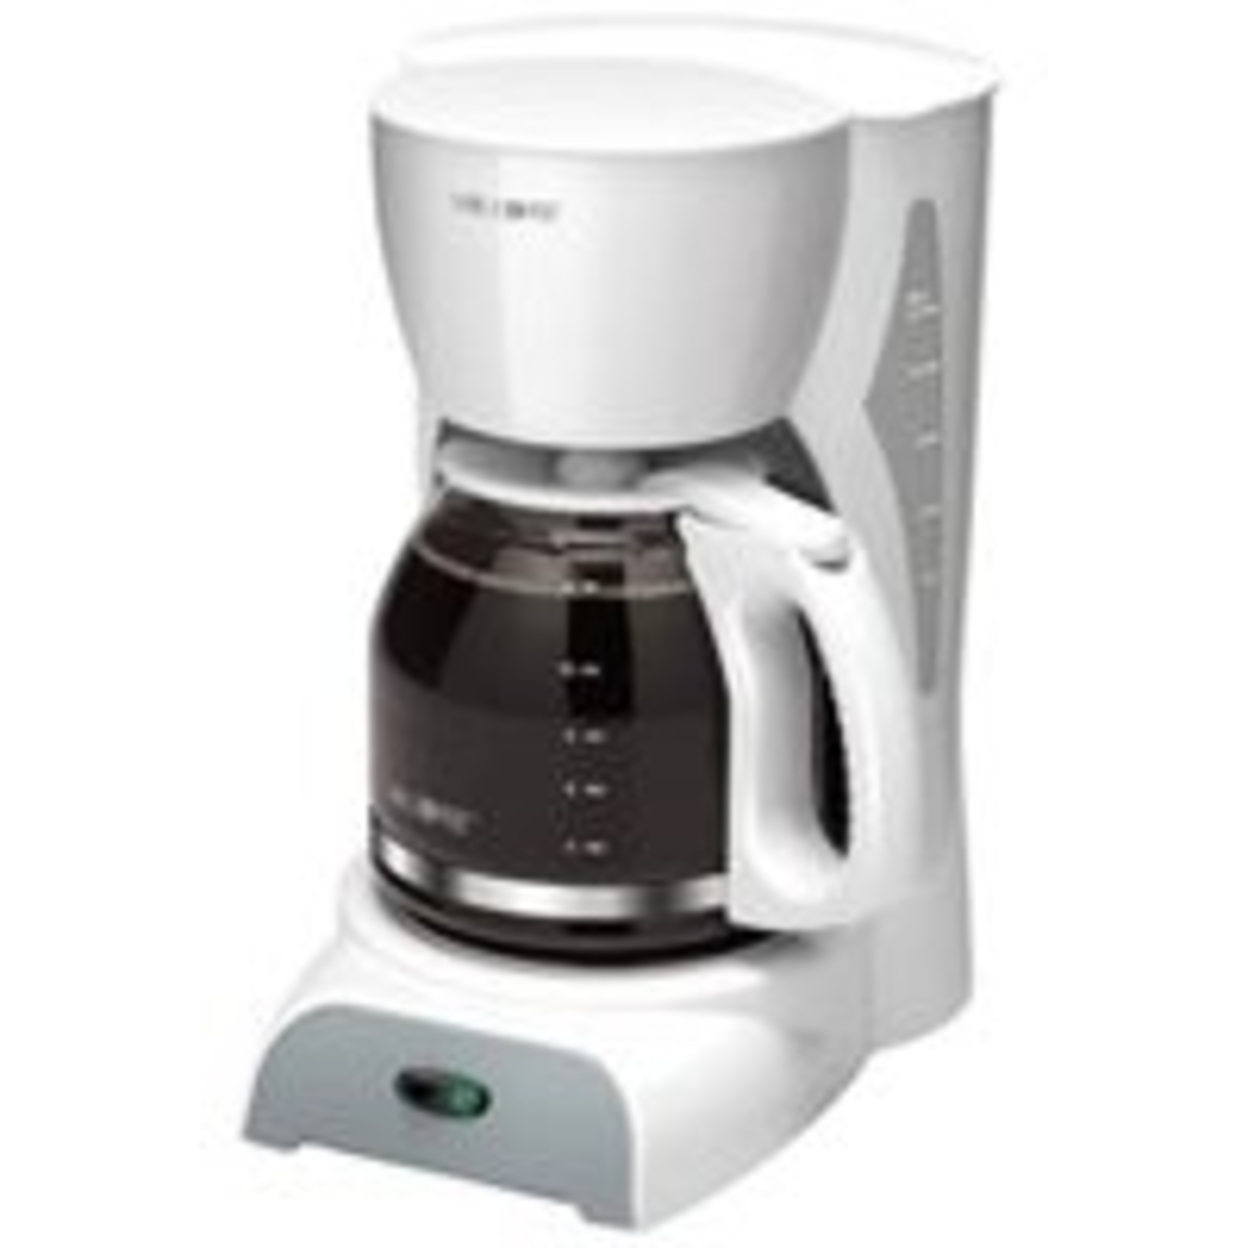 Sunbeam Rival Sk12-Np 12 Cup Coffeemaker, White 5a3d568c2a00e466c140b1b4